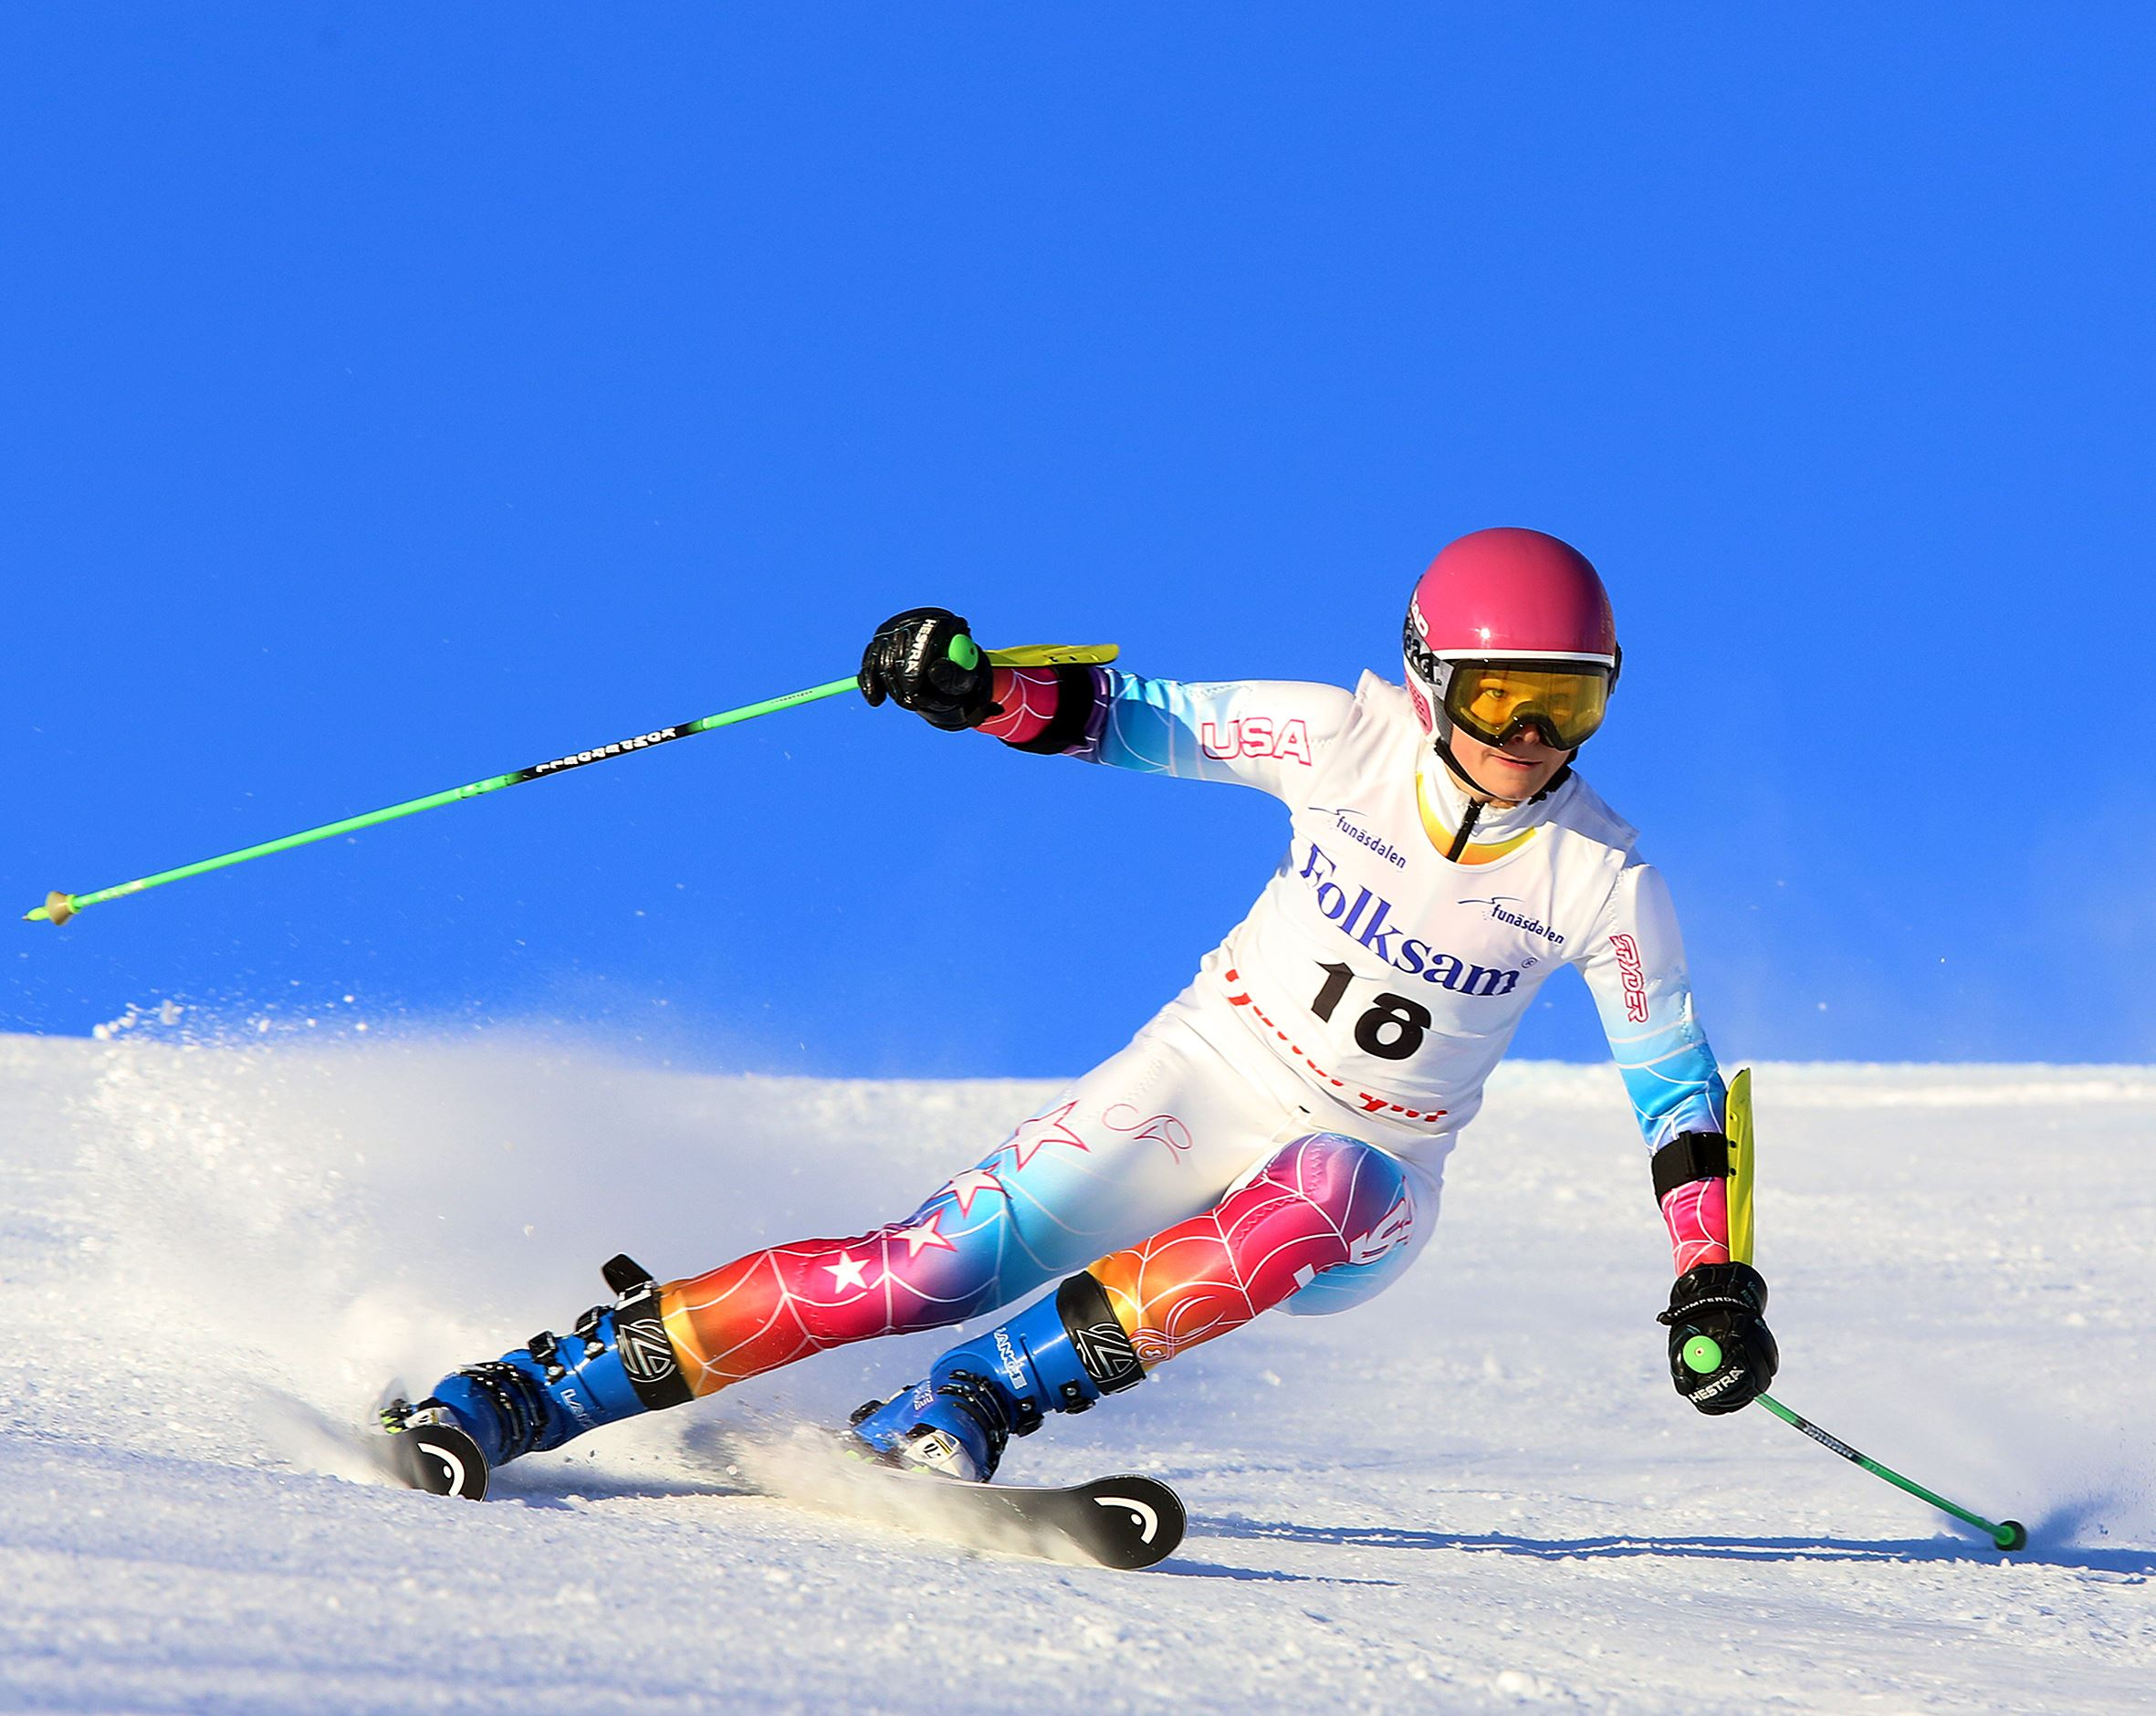 FIS-alpin storslalom tävling